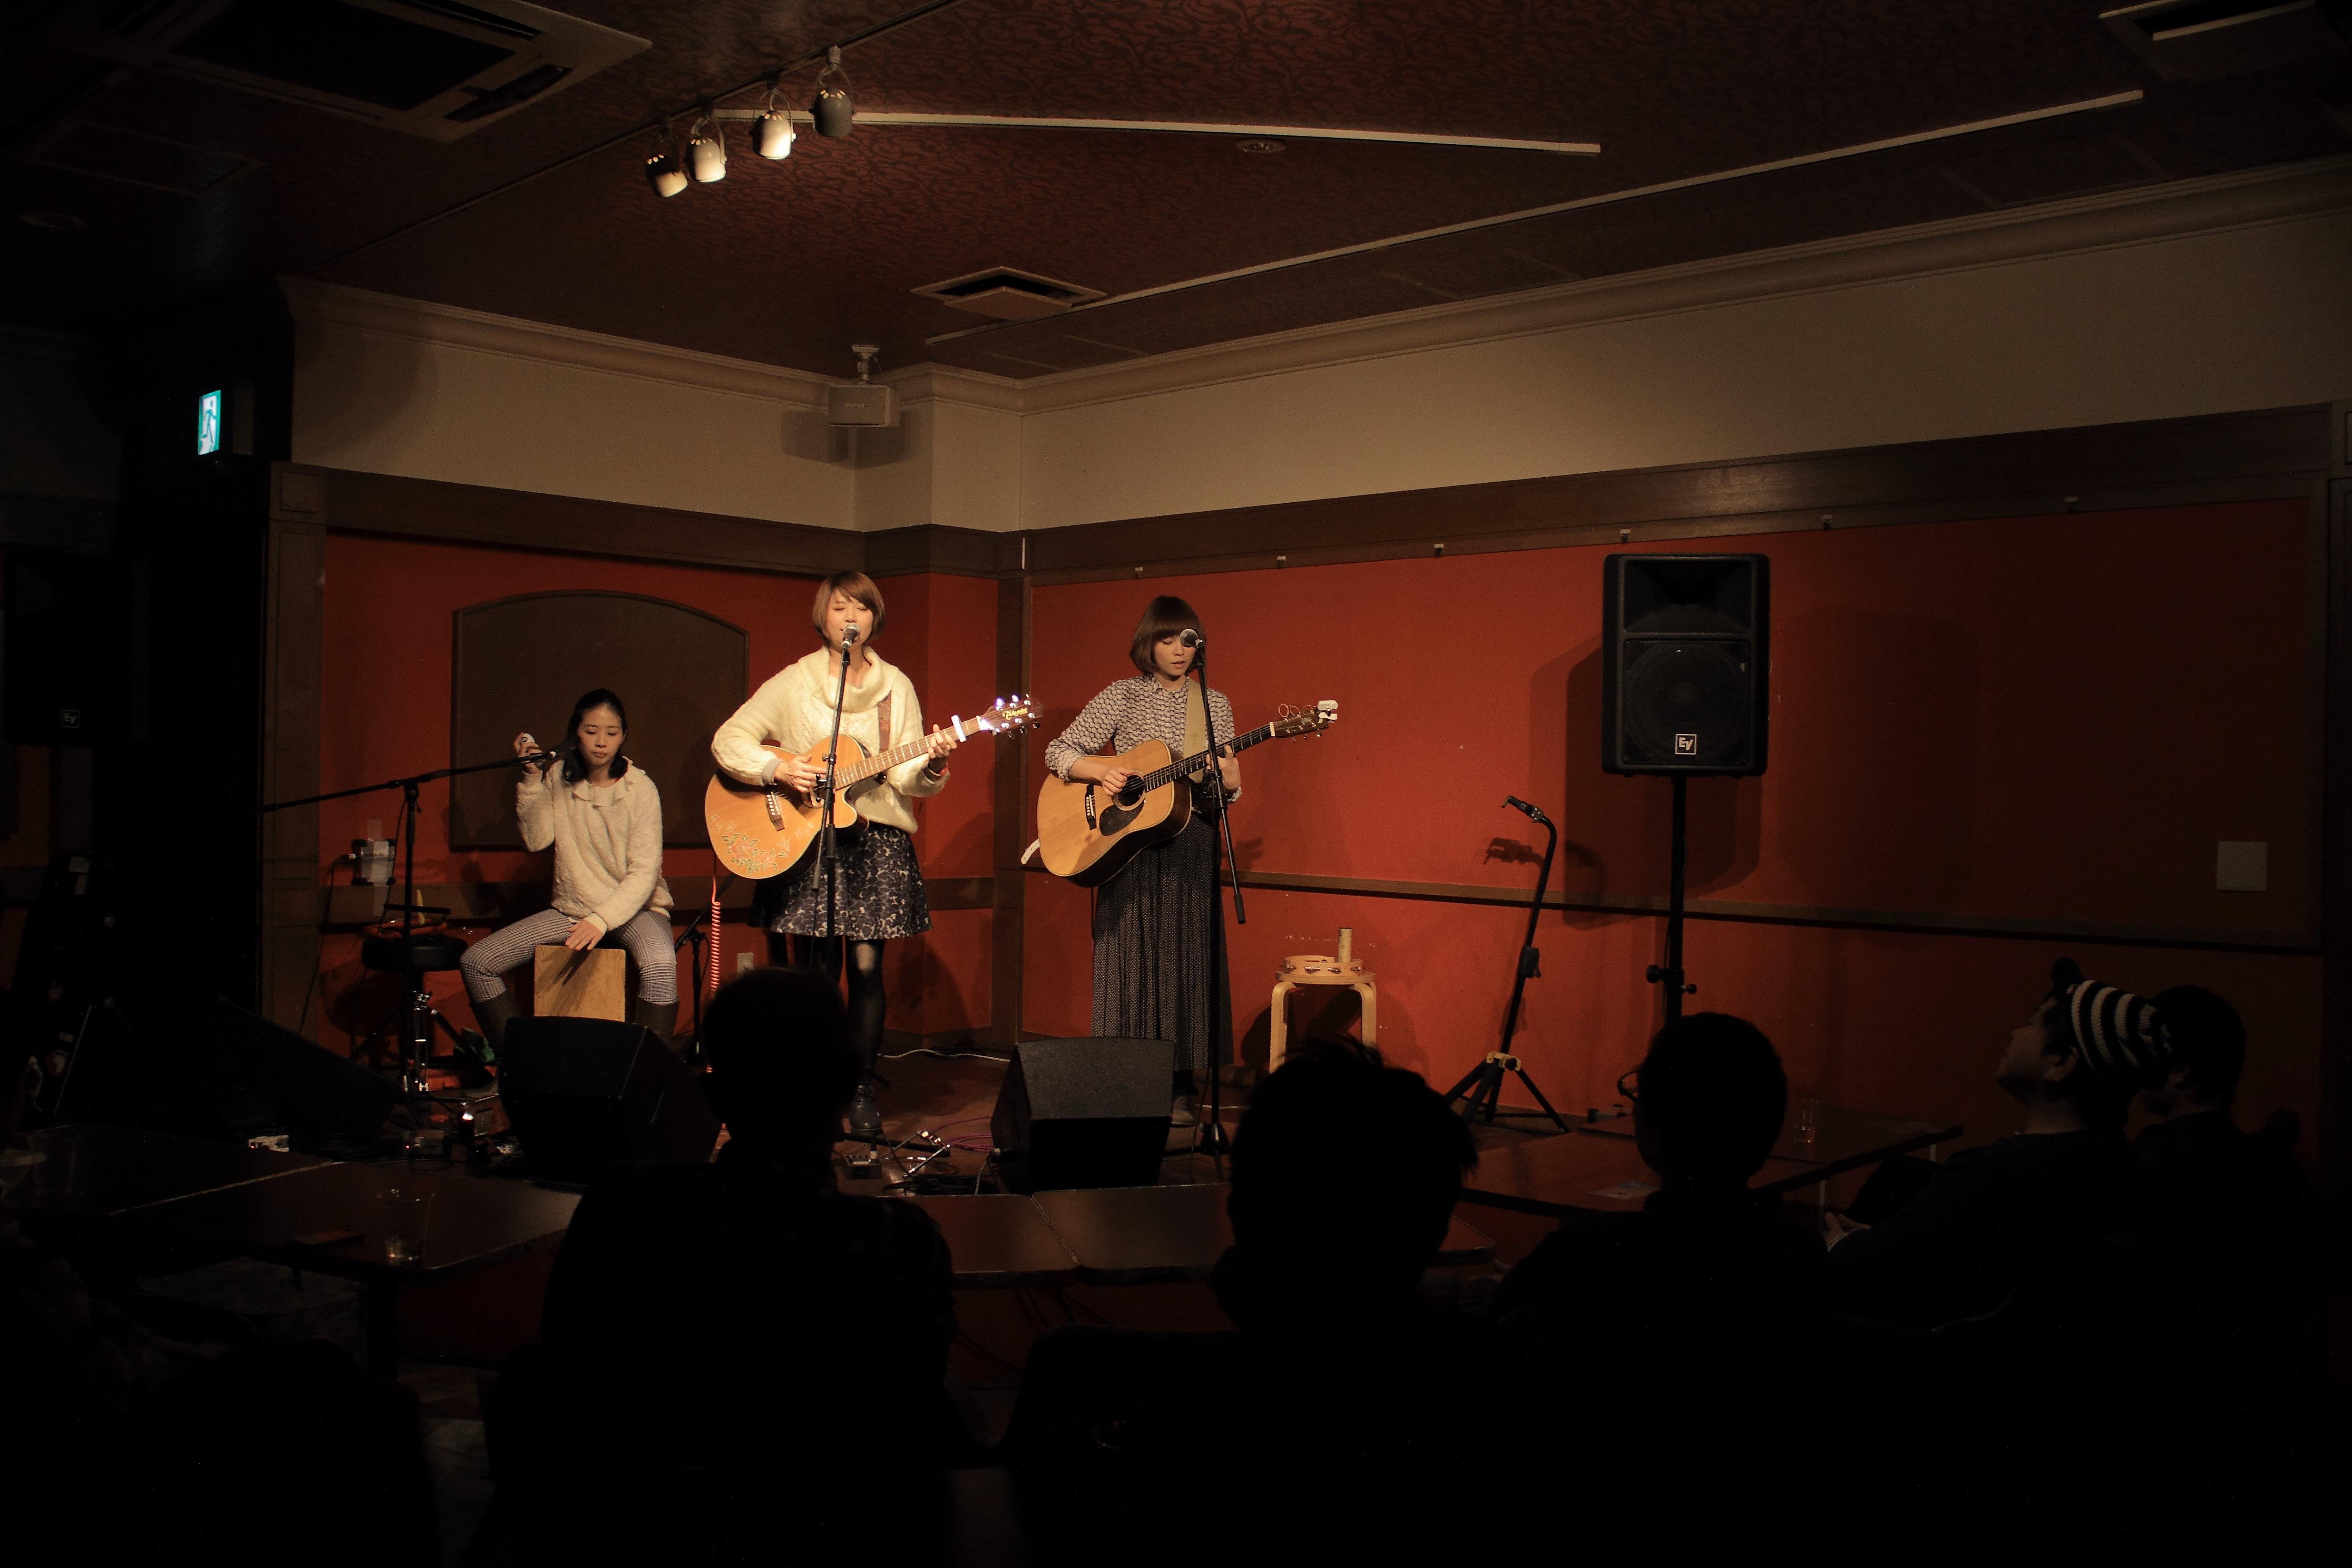 2013 大阪Mambo Cafe演出